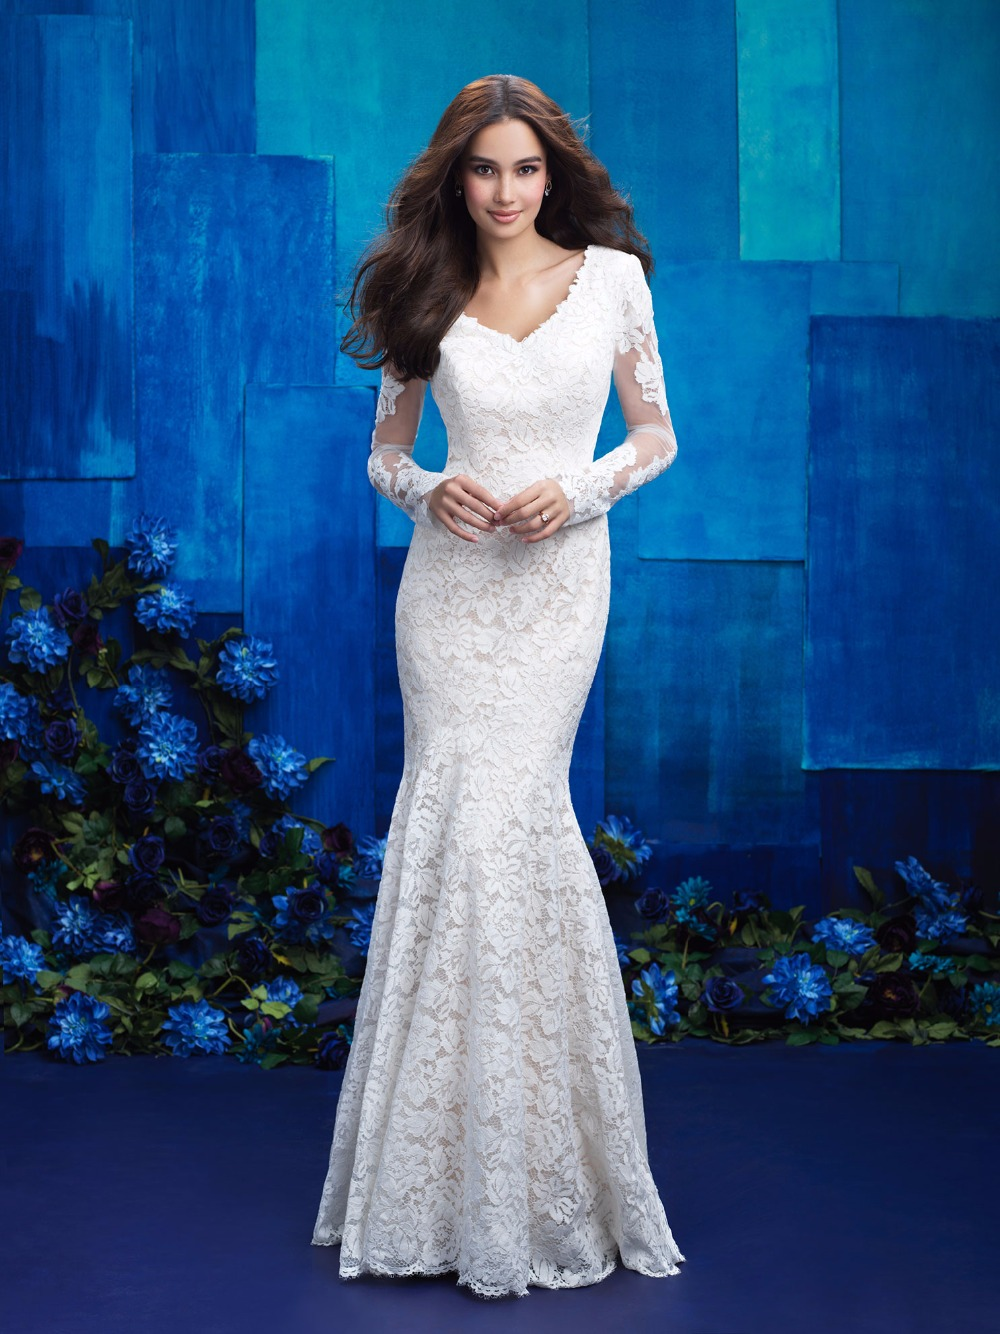 Reifes Hochzeitskleid